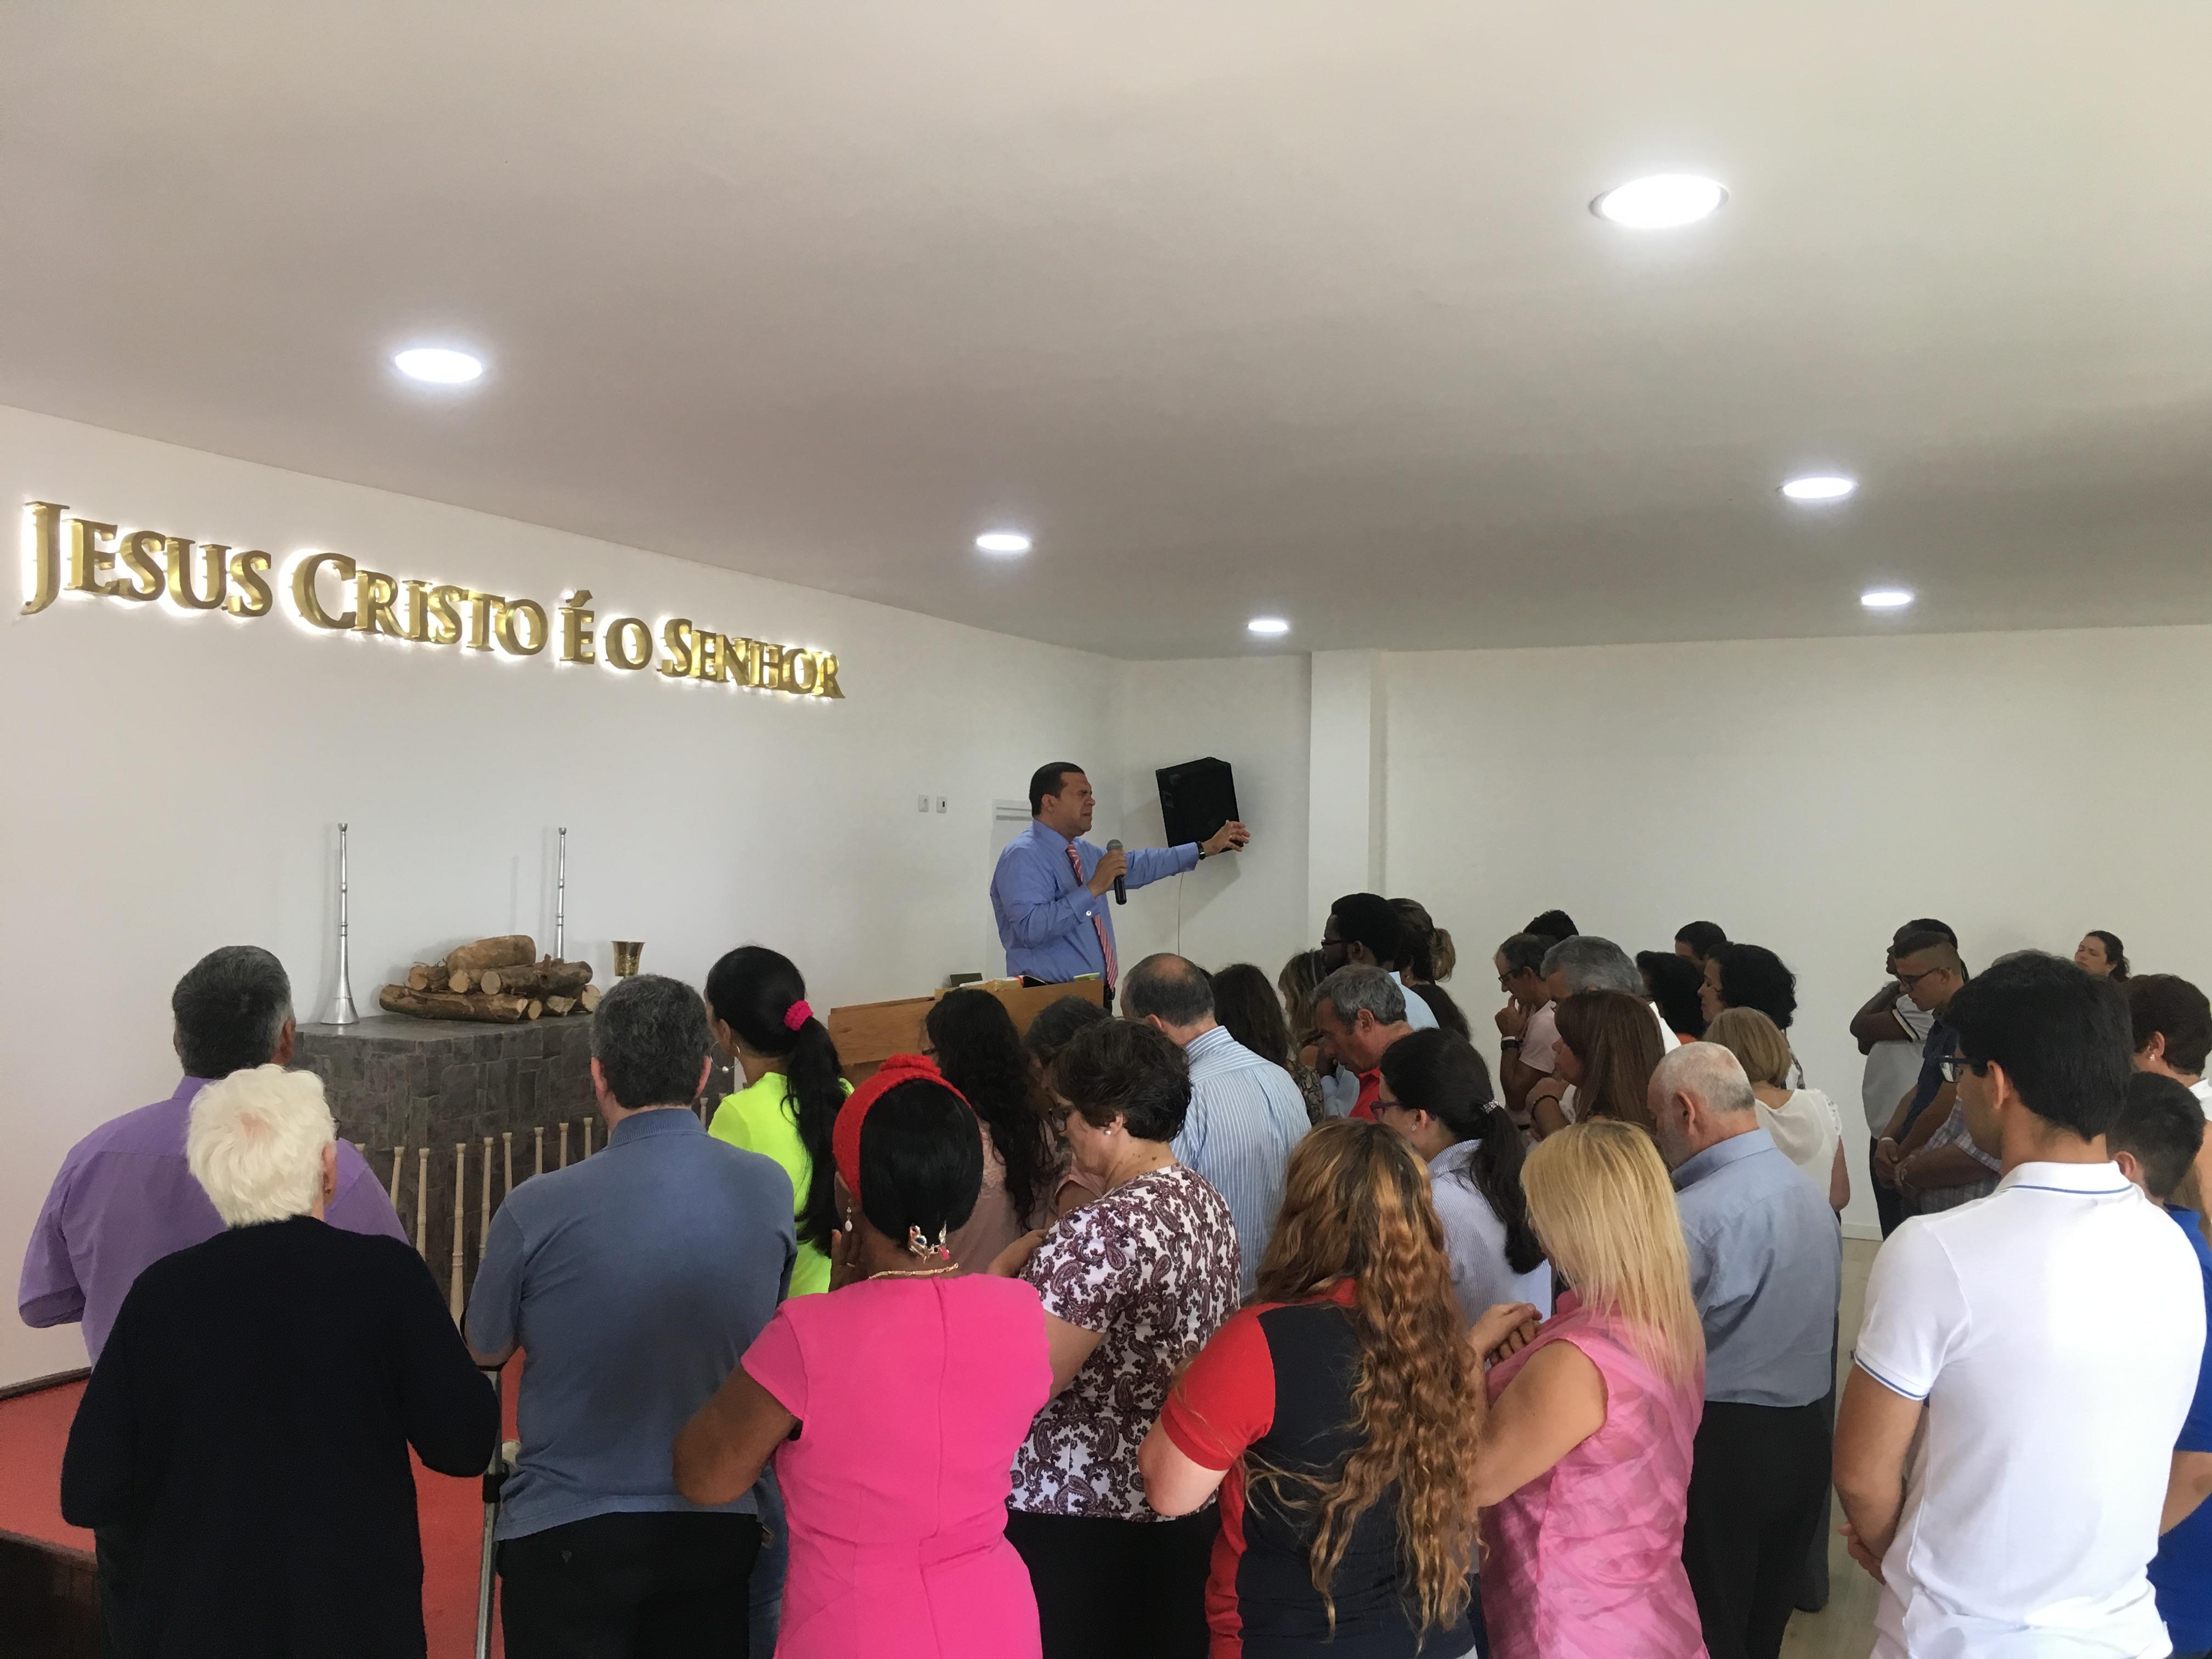 Universal inaugura primeiro templo na cidade de Covilhã2 min read